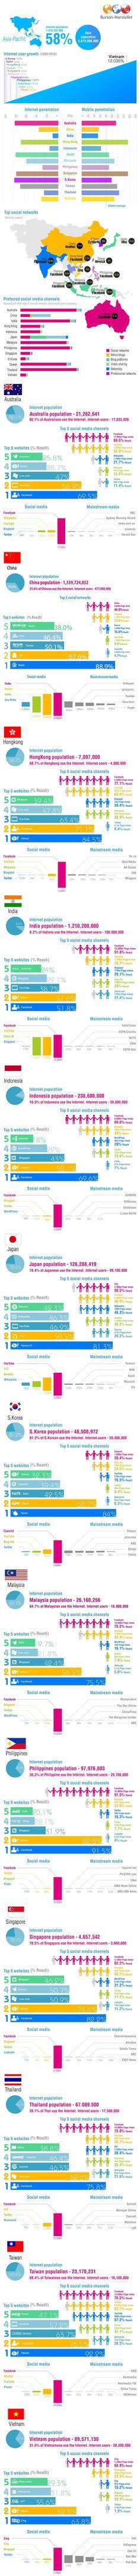 Global Social